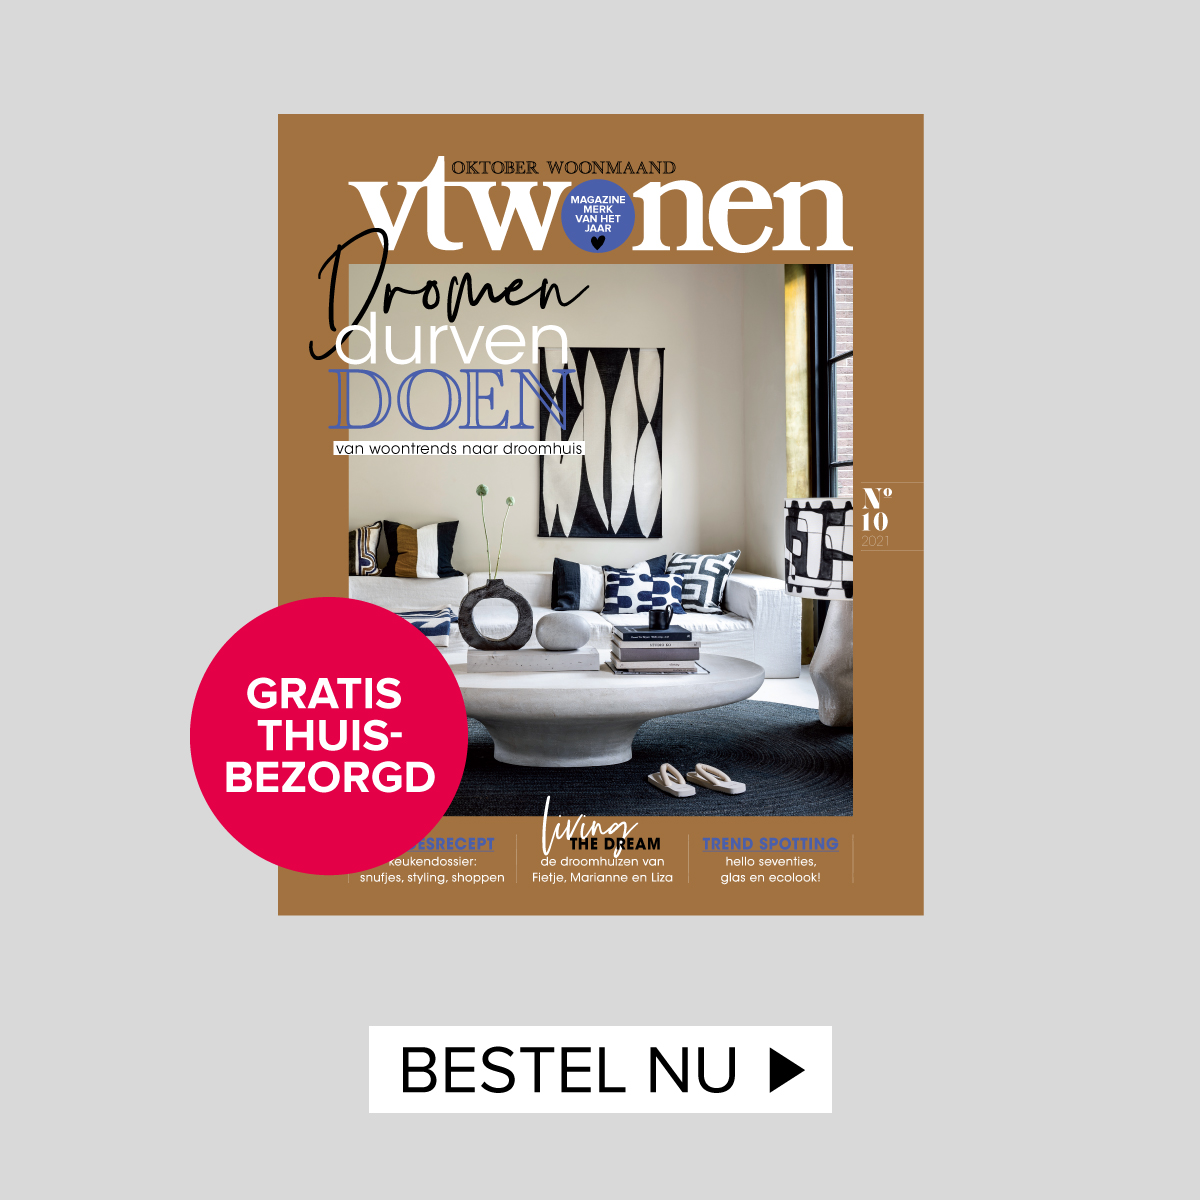 vtwonen magazine 10-2021